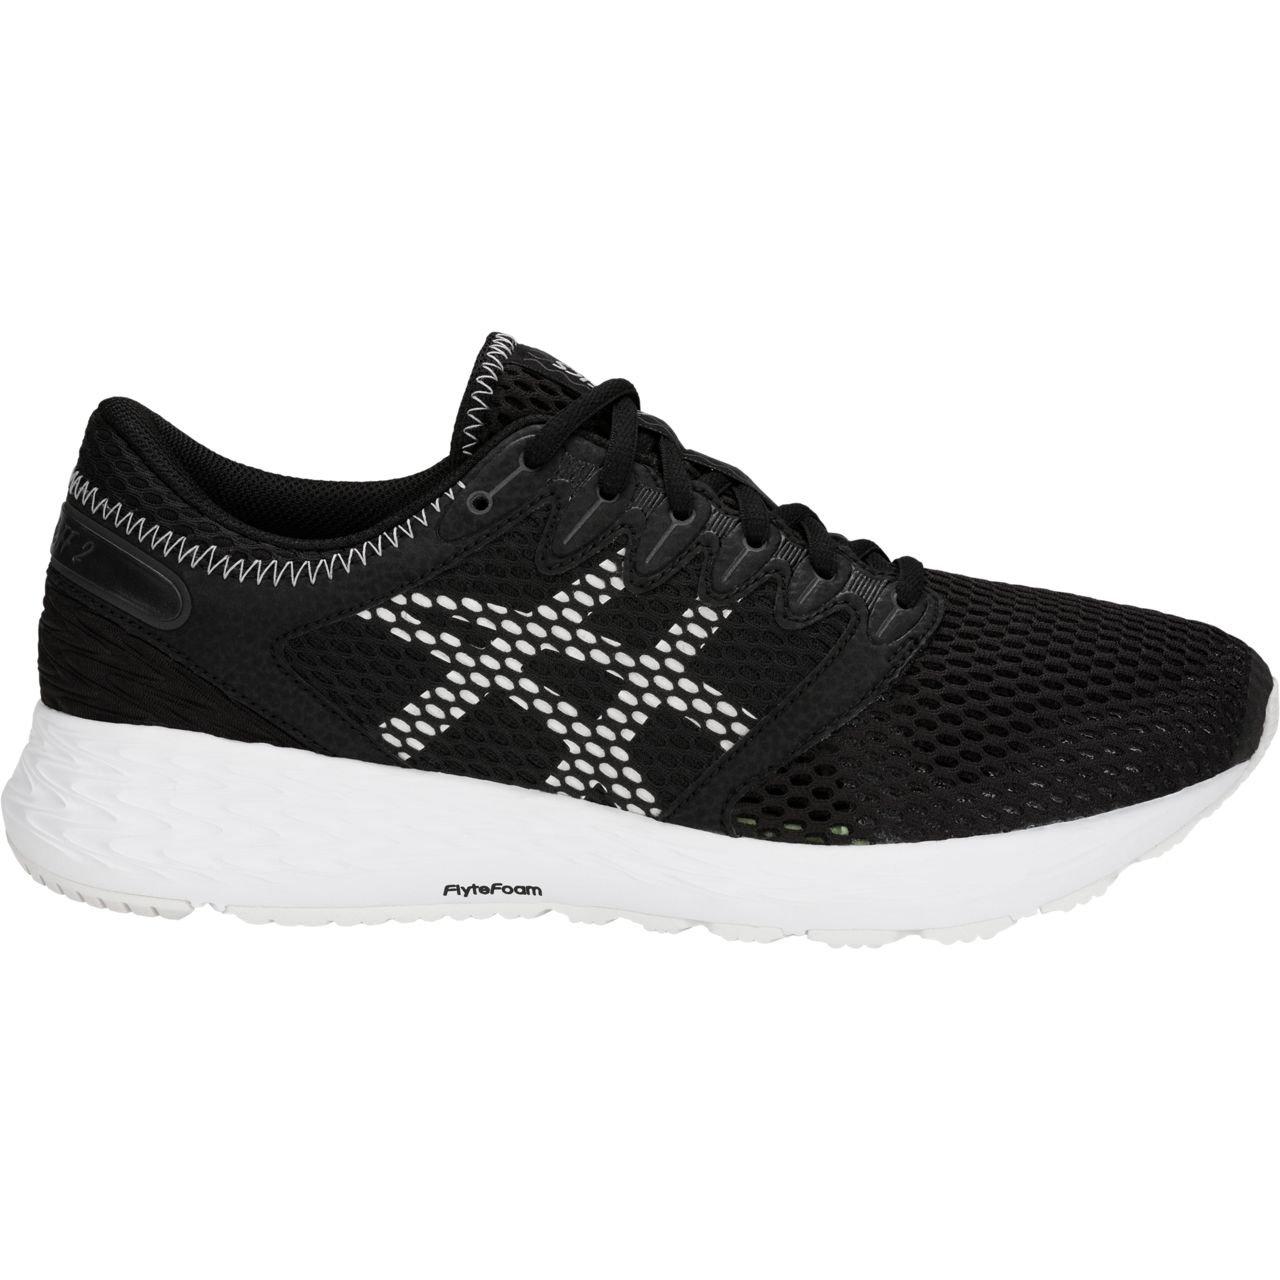 Bk White ASICS Women's Roadhawk Ff 2 Running shoes 1012A123